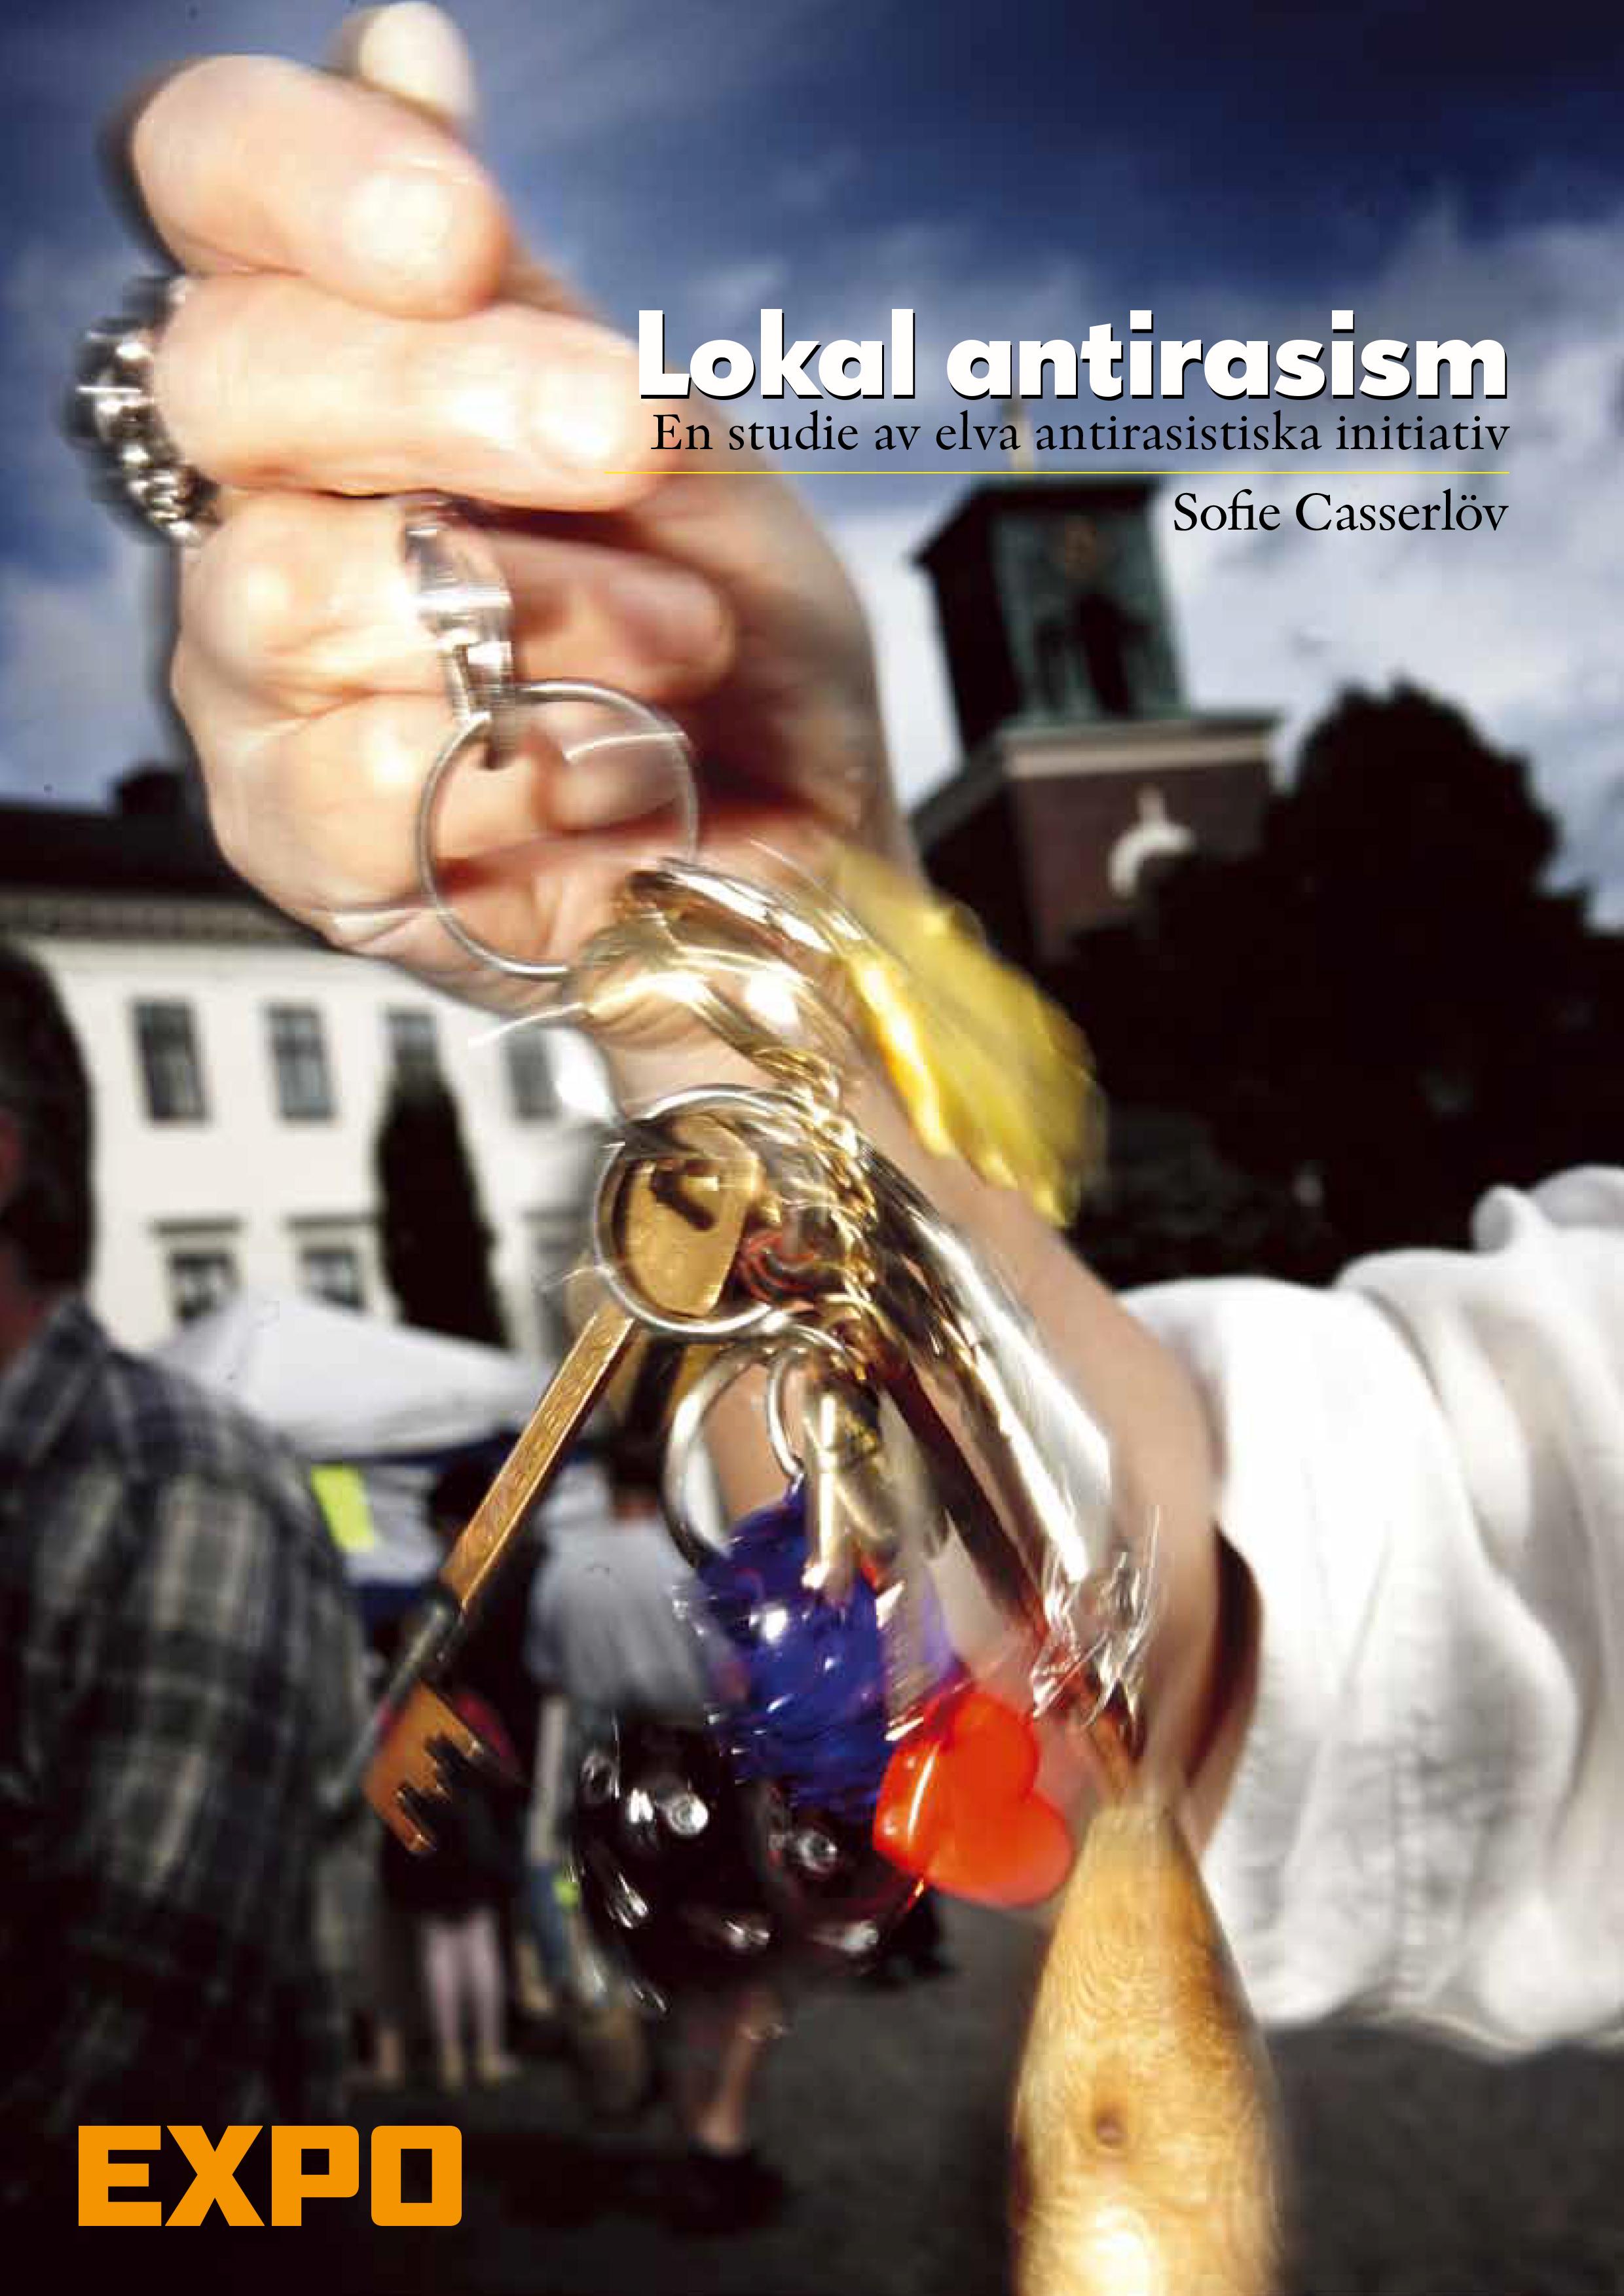 Lokal antirasism: En studie av elva antirasistiska initiativ